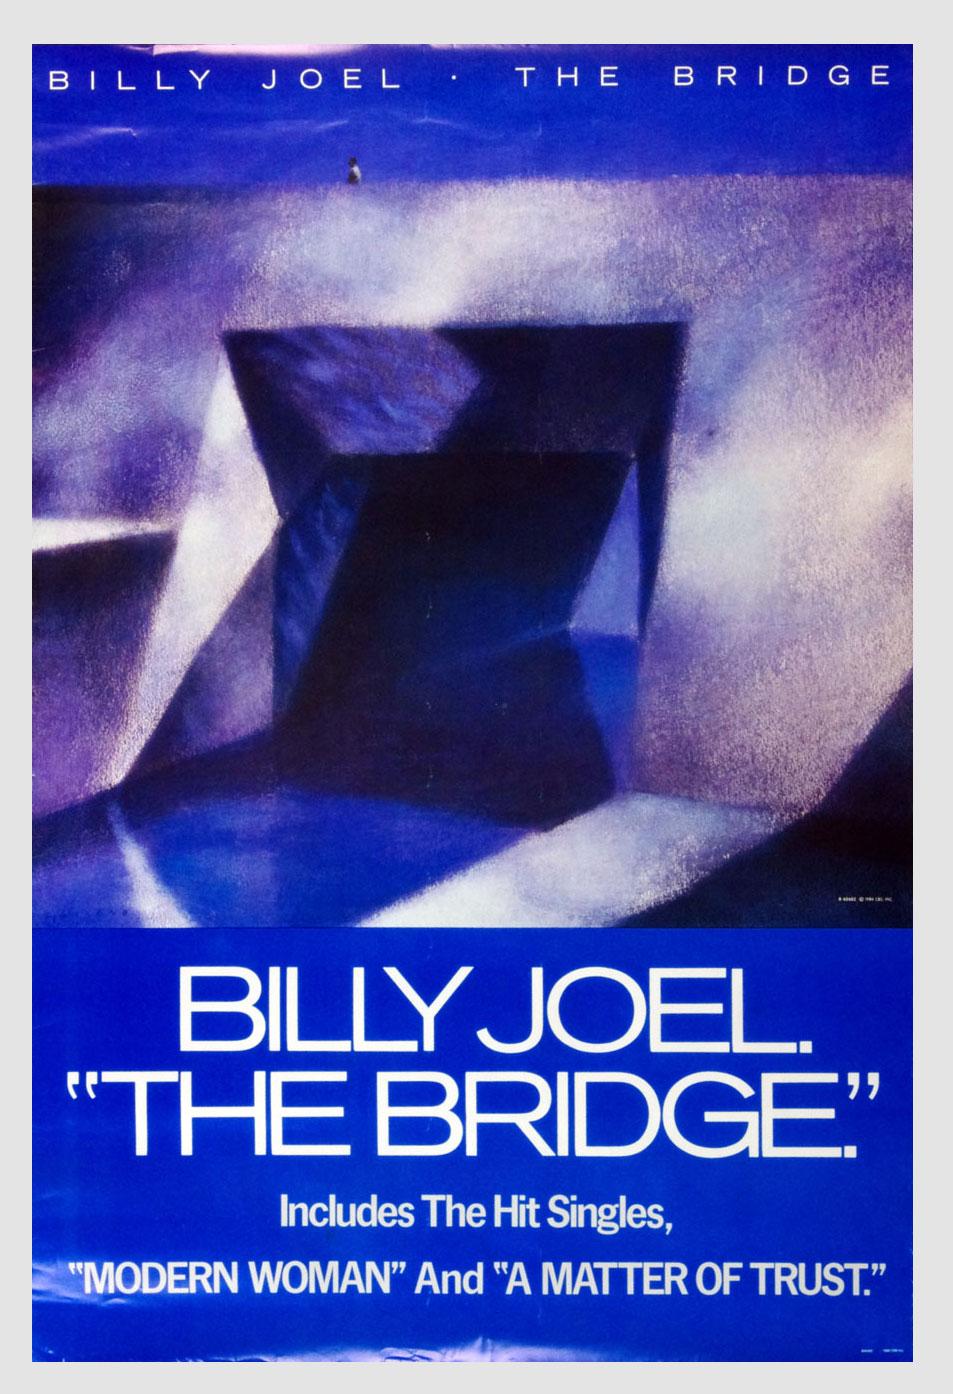 Billy Joel Poster The Bridge 1986 New Album Promotion 24 x 36